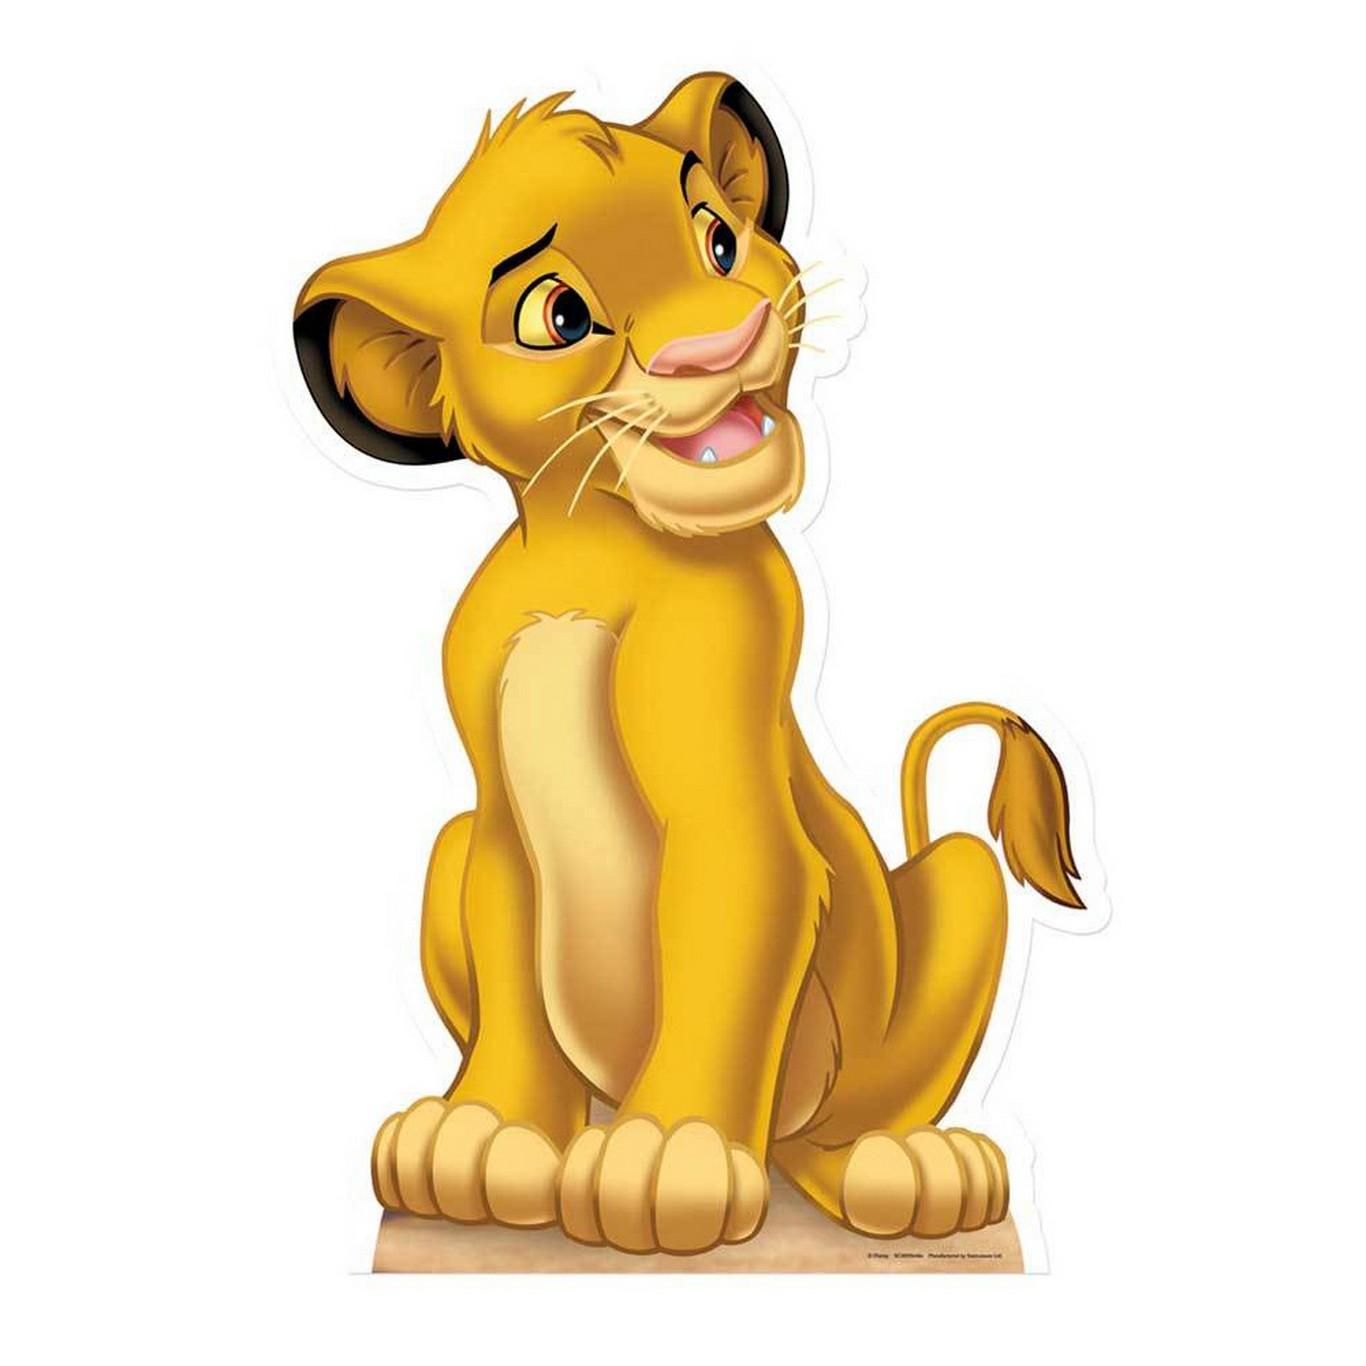 Lion king simba picture lion king simba wallpaper - Animaux du roi lion ...